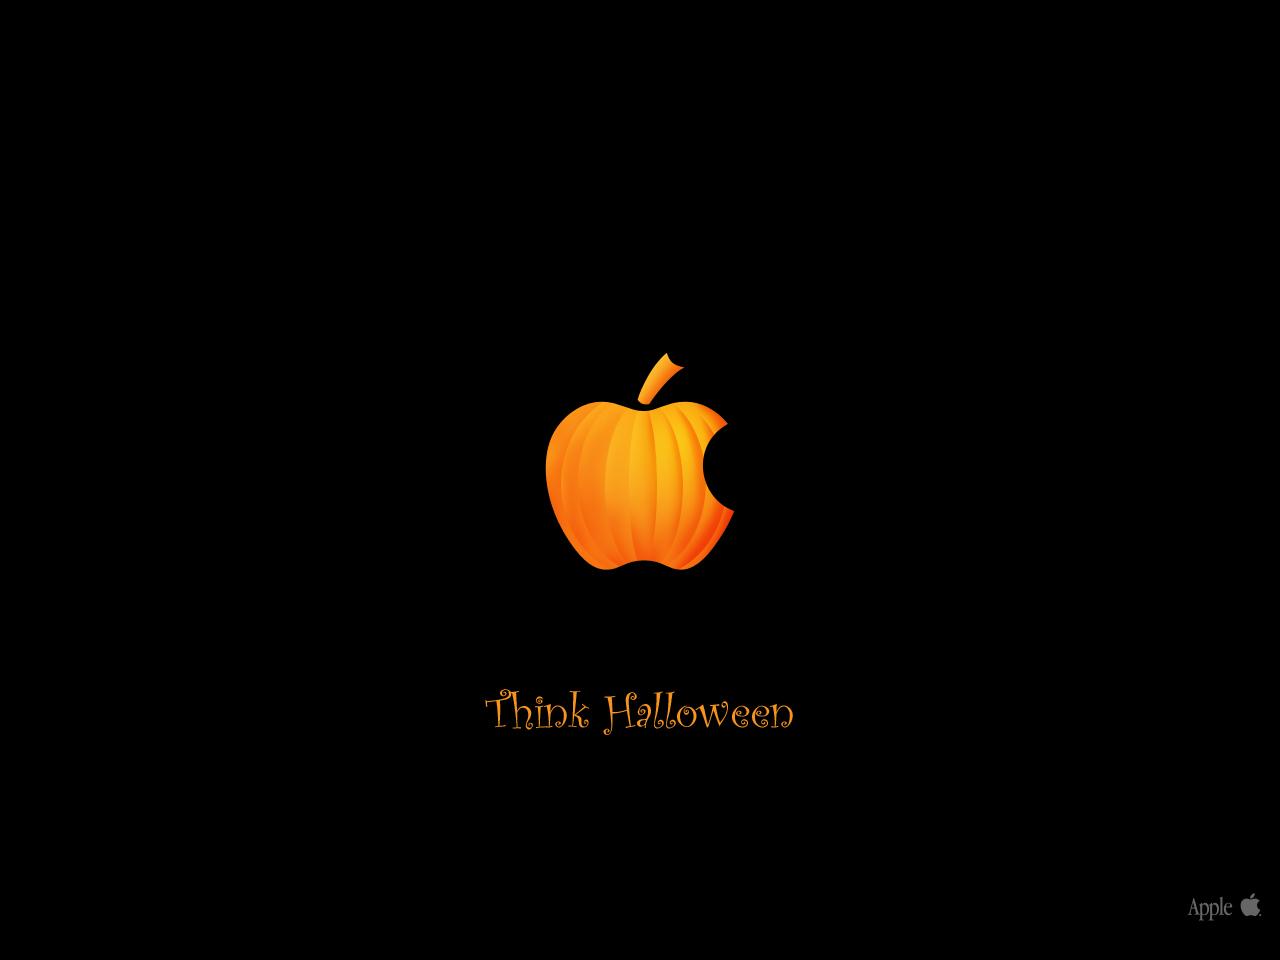 fondos halloween wallpapers gratis - photo #27